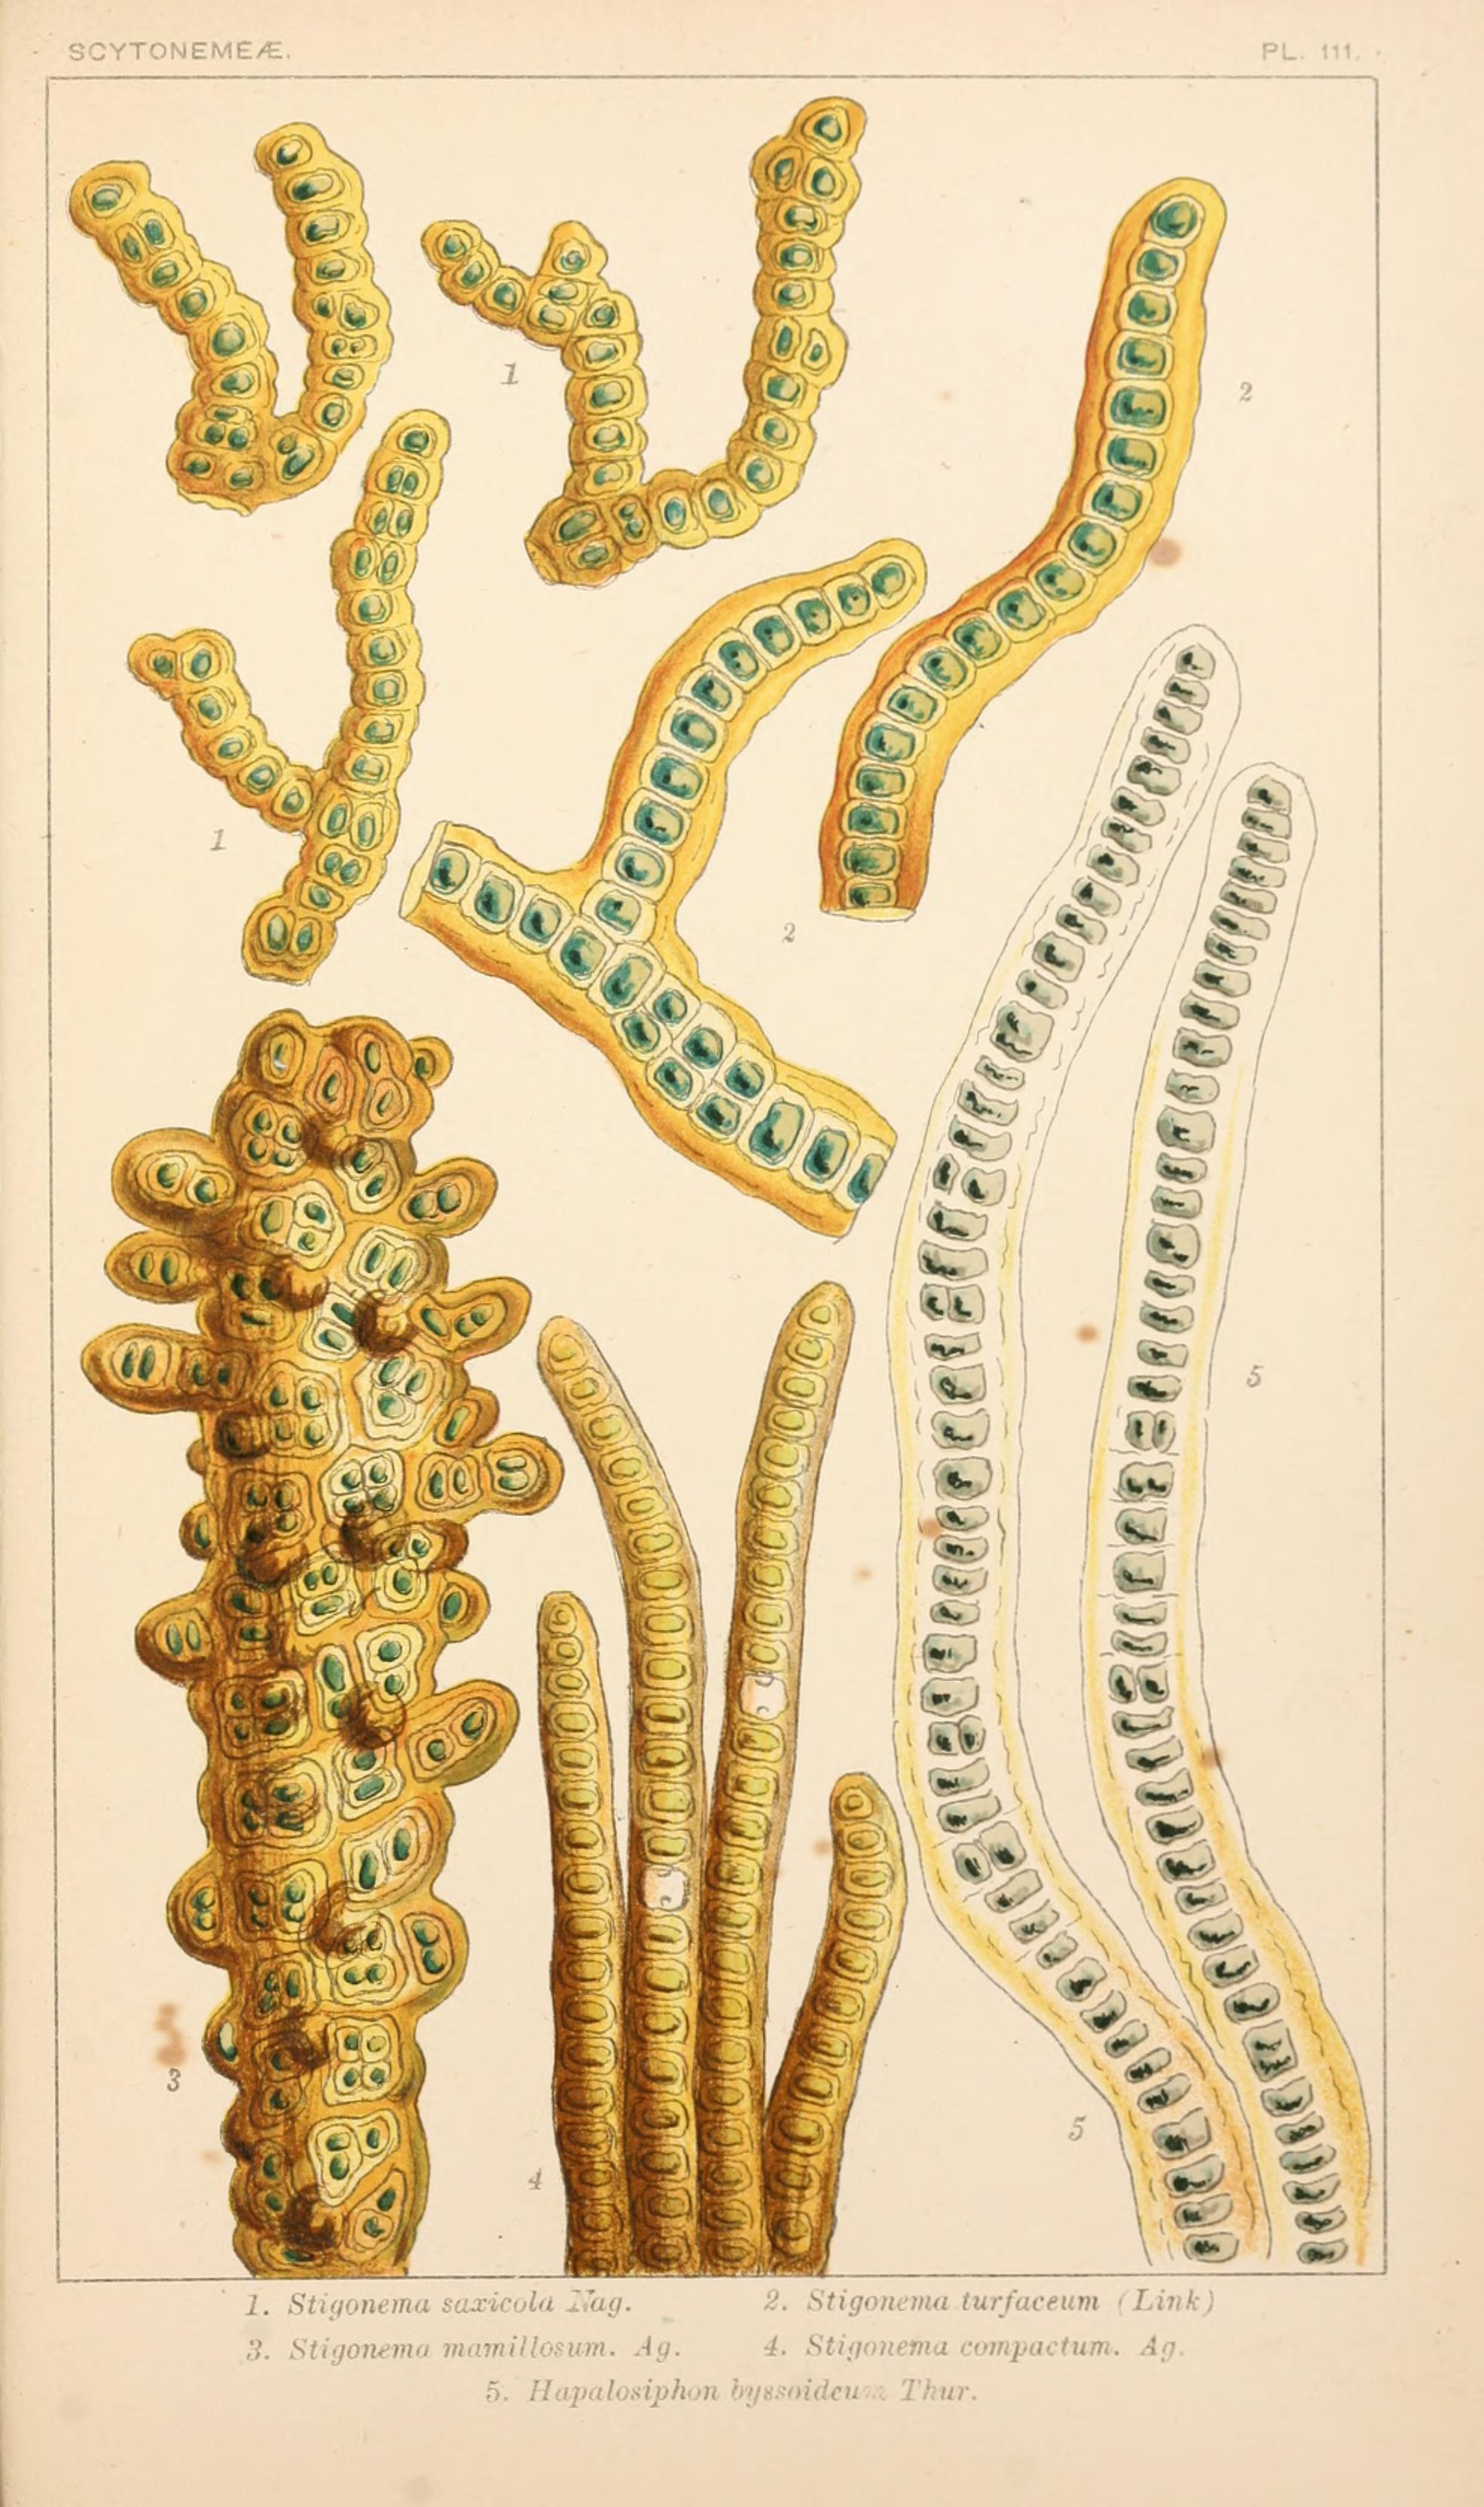 Image of Stigonematales